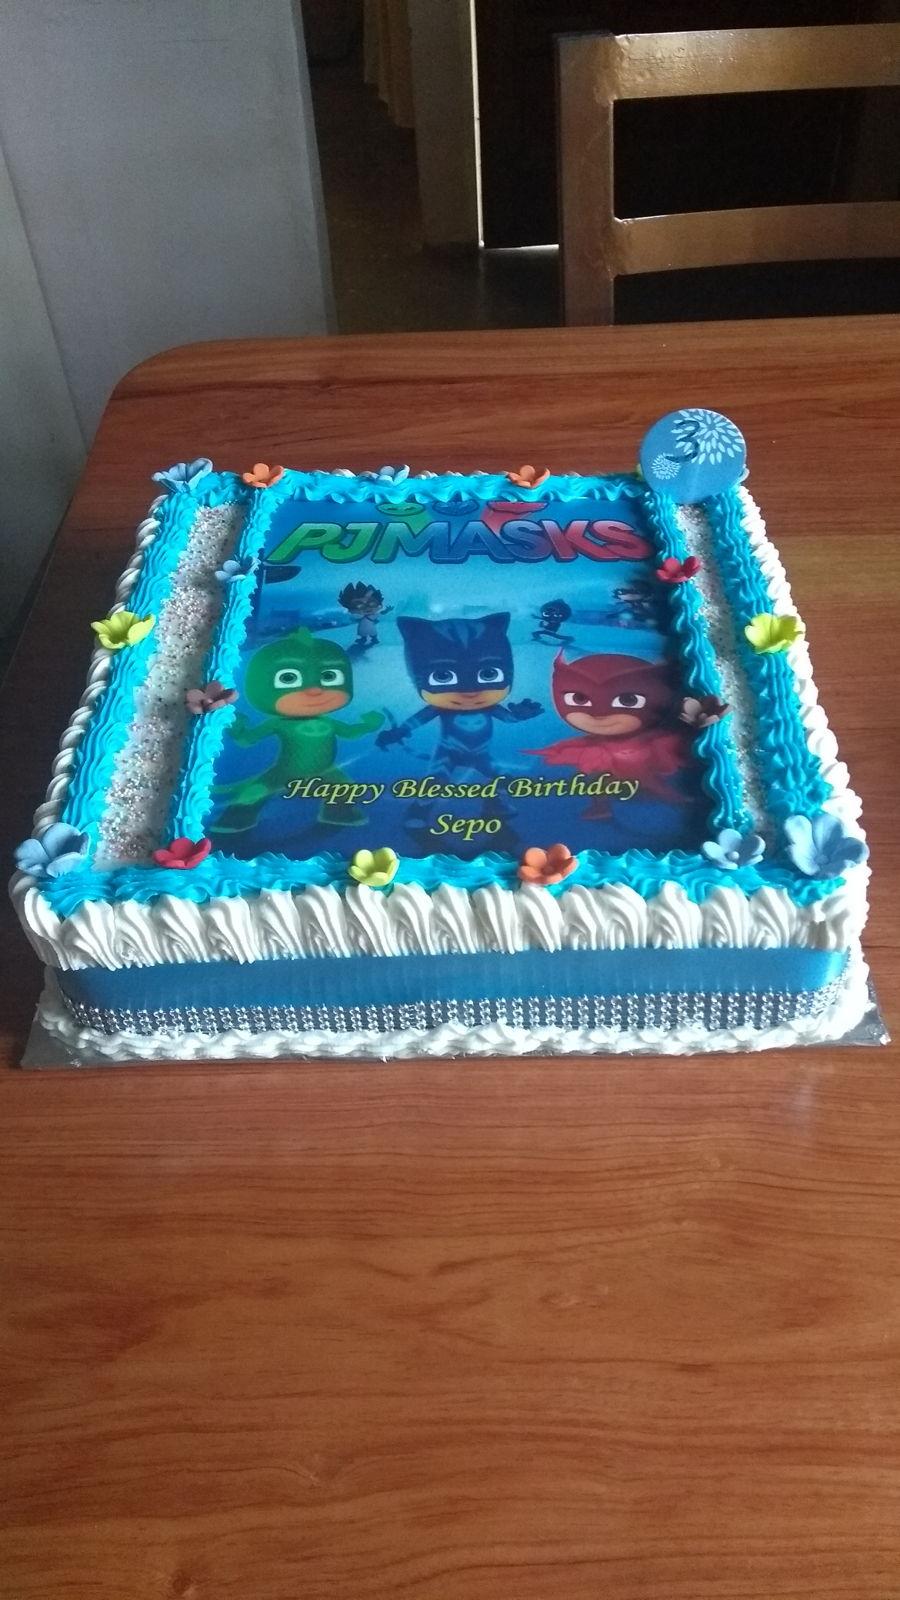 Stupendous Birthday Cake Boys Cakecentral Com Personalised Birthday Cards Petedlily Jamesorg